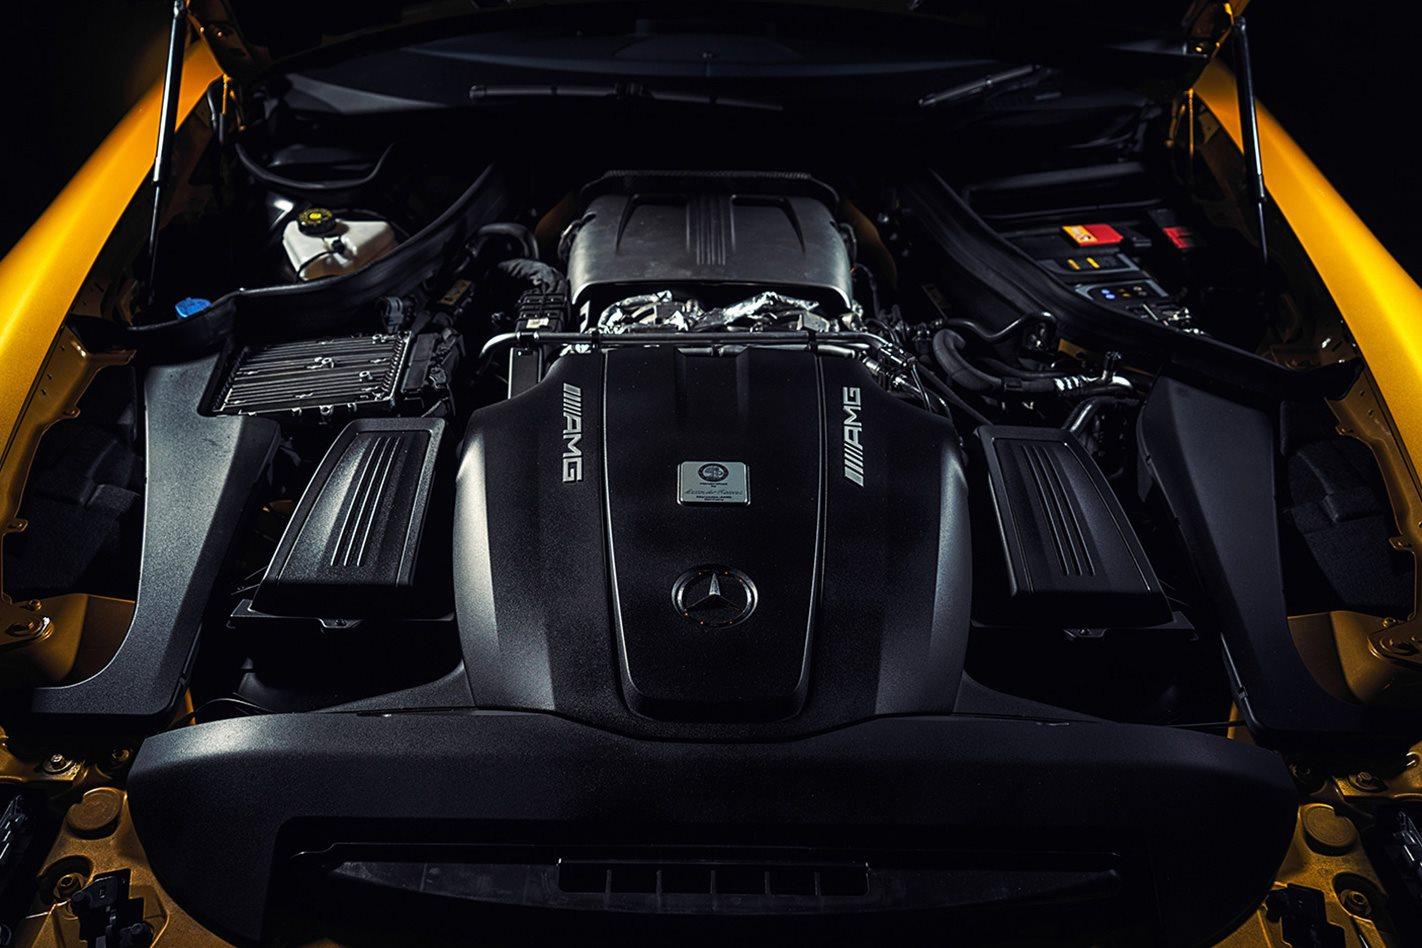 2018-Mercedes-AMG-GT-S-engine.jpg